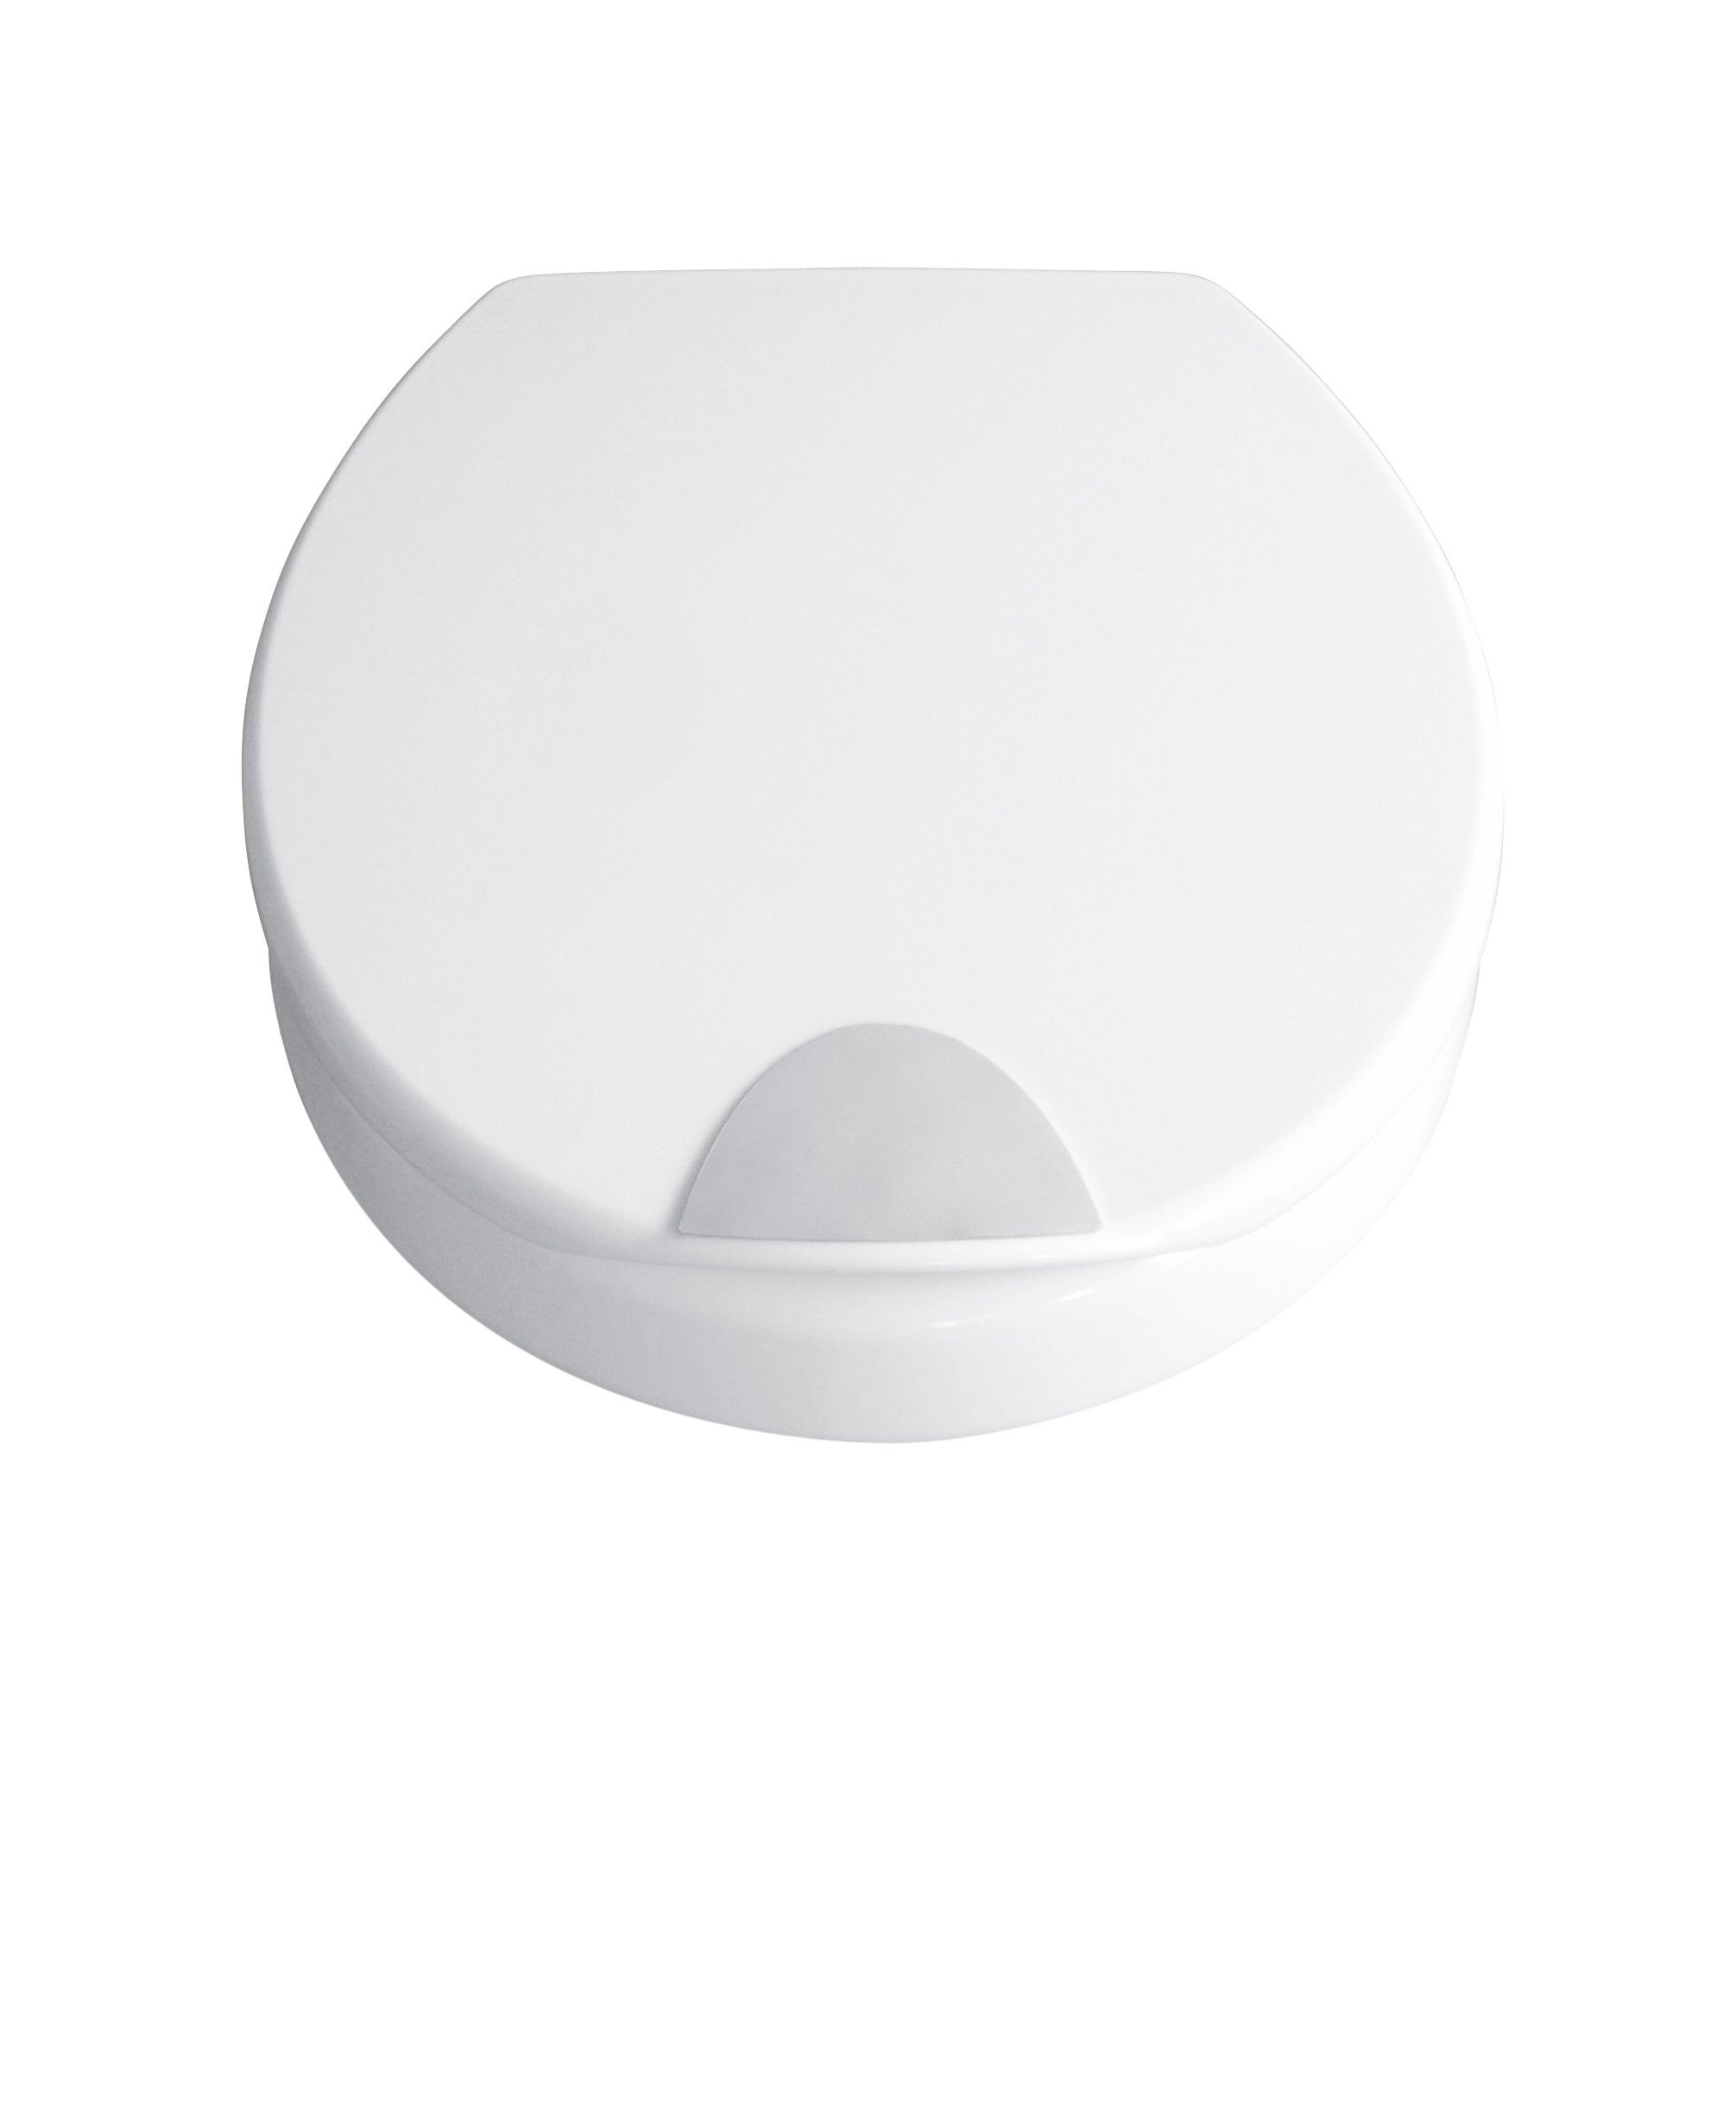 ADOB WC Sitz Firenze mit Absenkautomatik